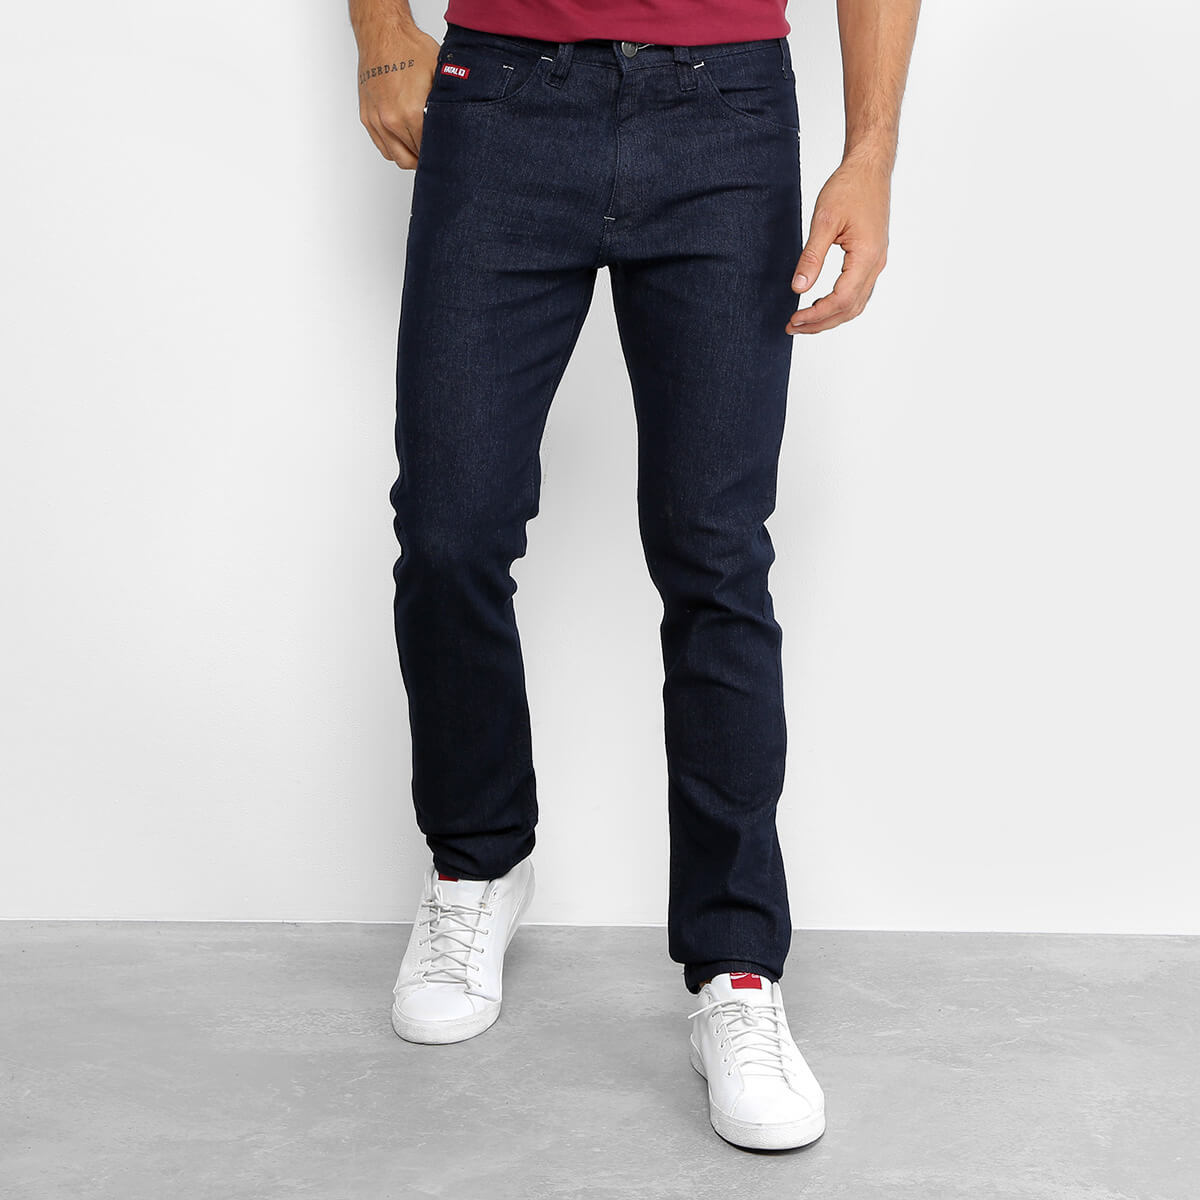 calca fatal - Calça Jeans Skinny Fatal Clássica - R$ 76,49